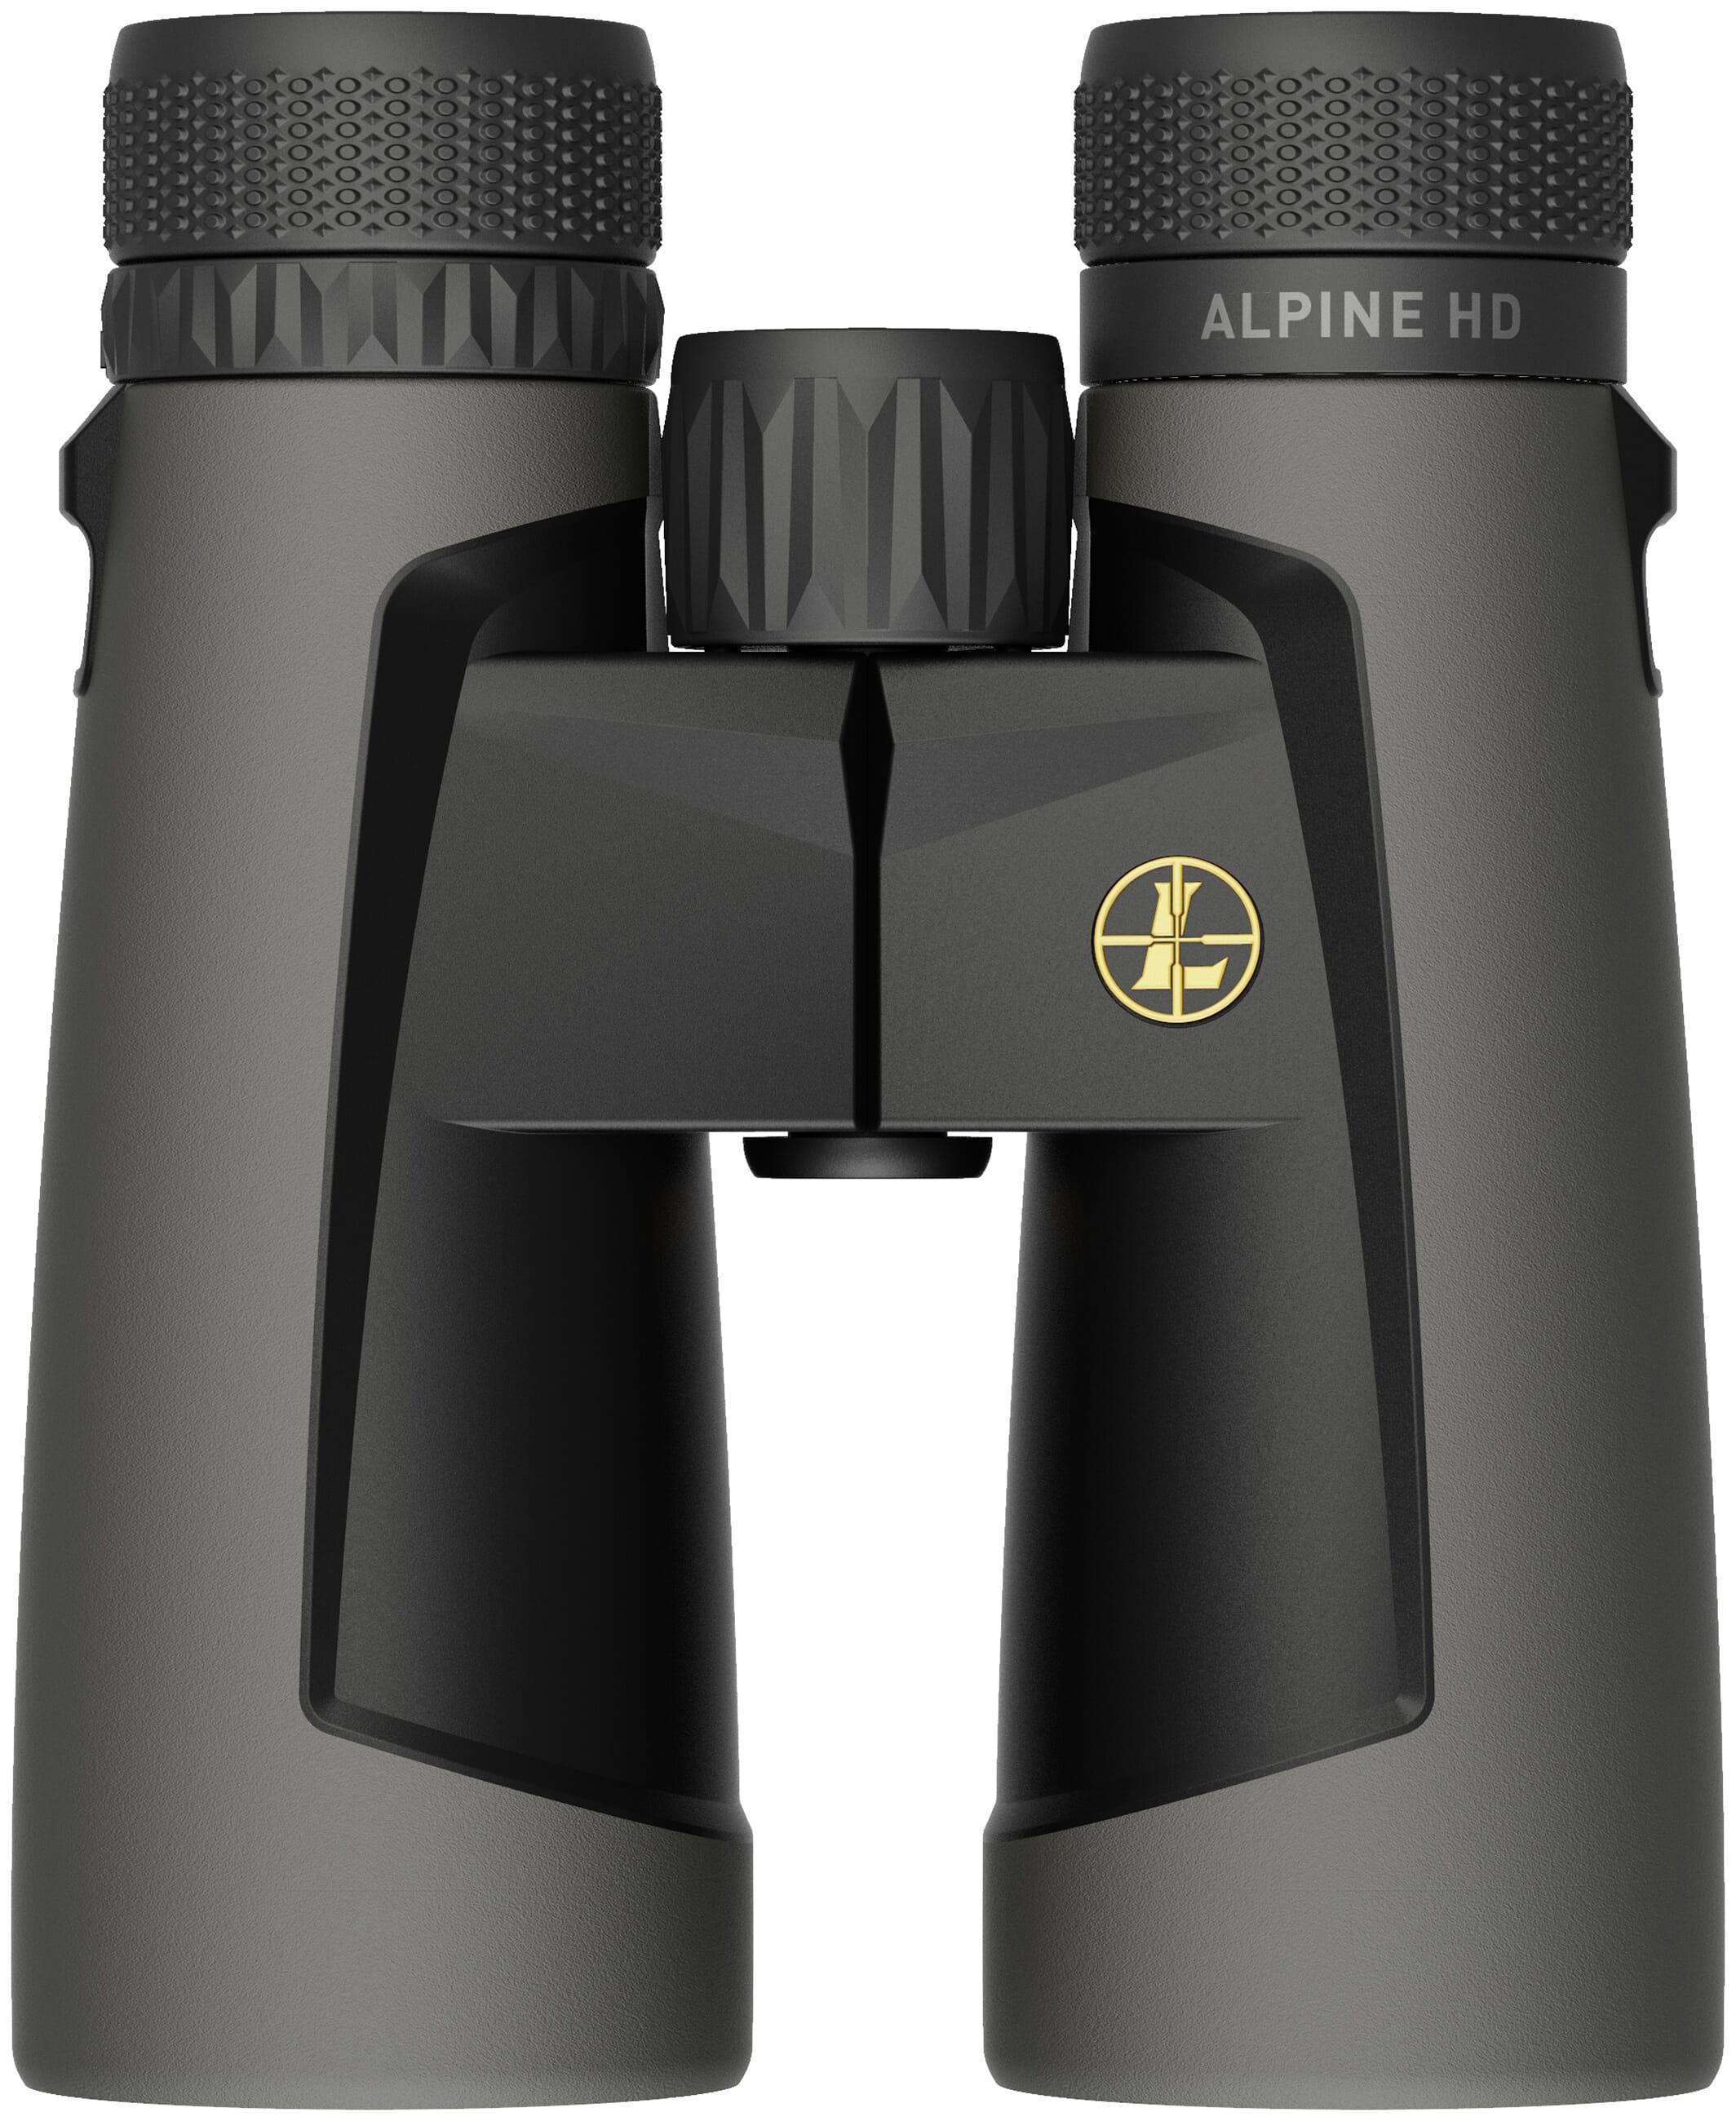 Leupold BX-2 Alpine HD 12x52mm Roof Shadow Gray Binoculars 181179